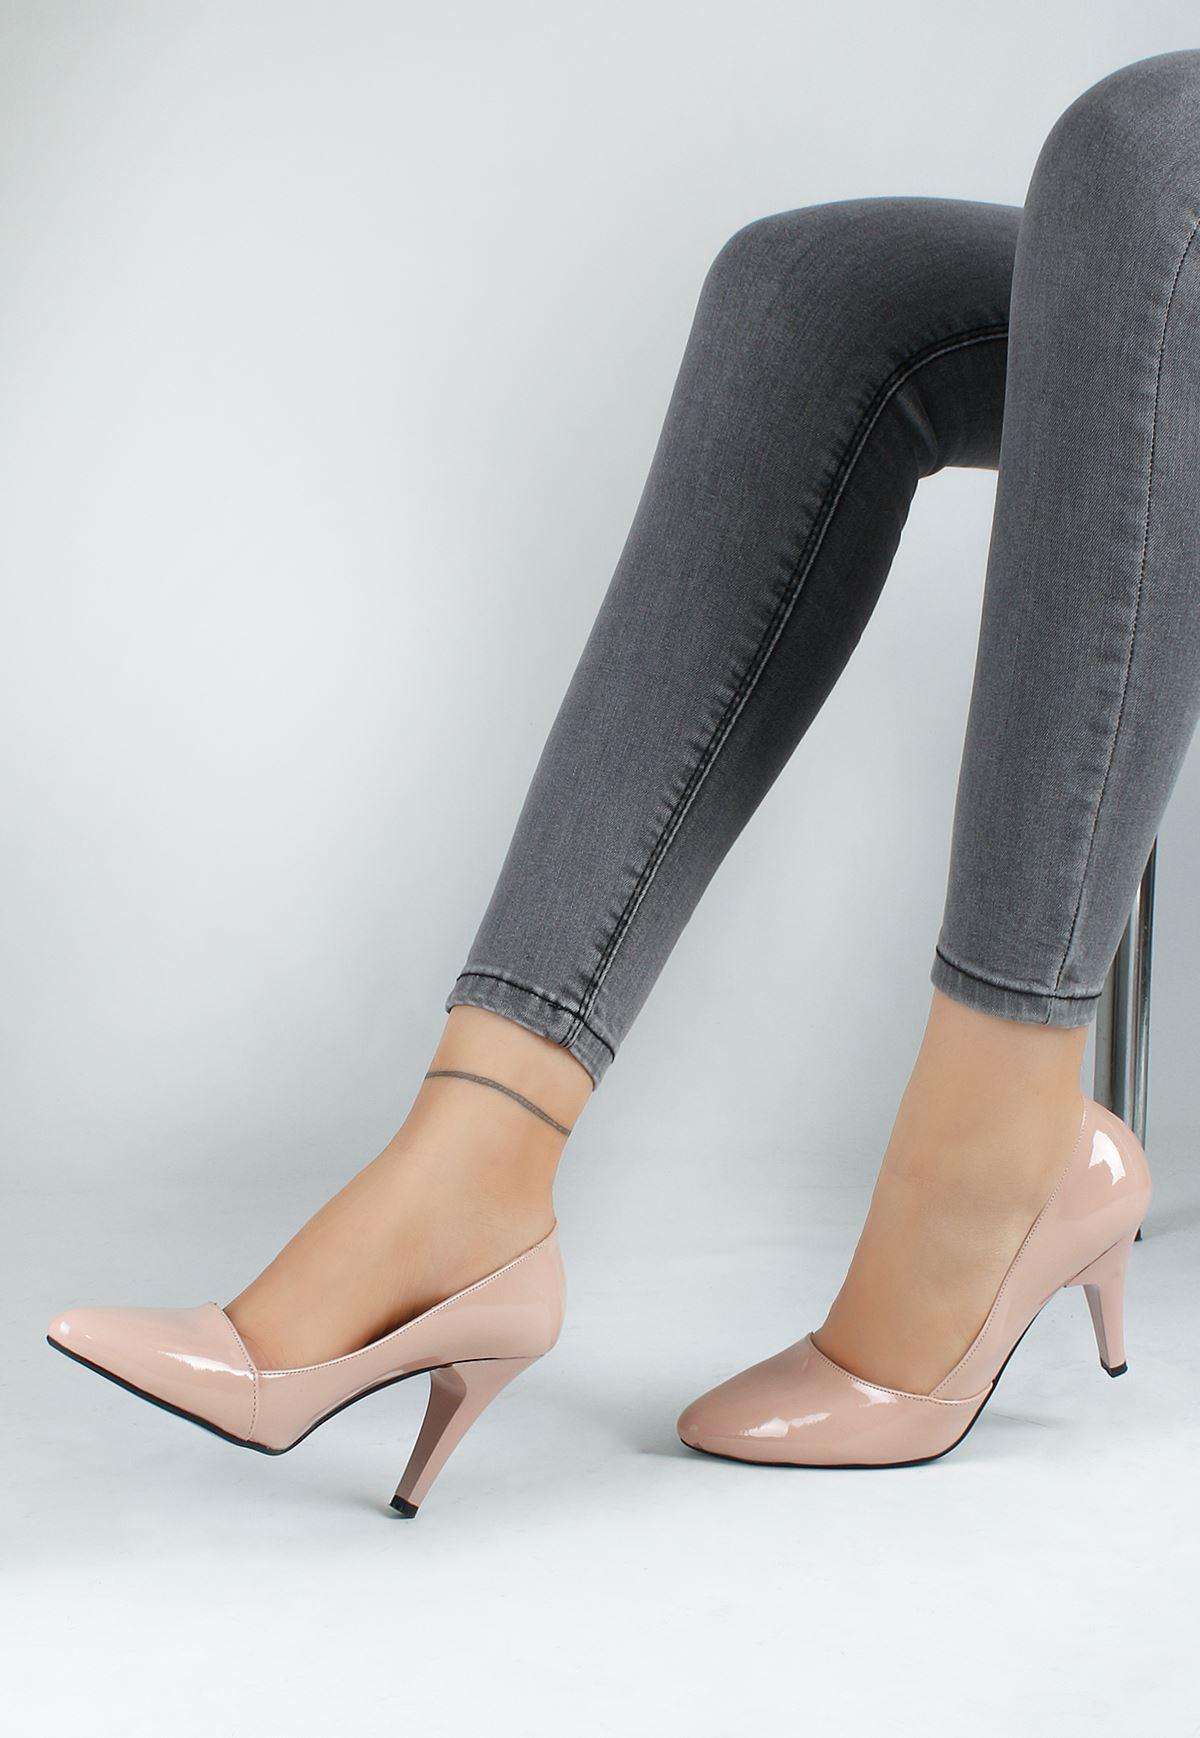 Erb Pudra Rugan Yan Kesim Bayan Stiletto Ayakkabı